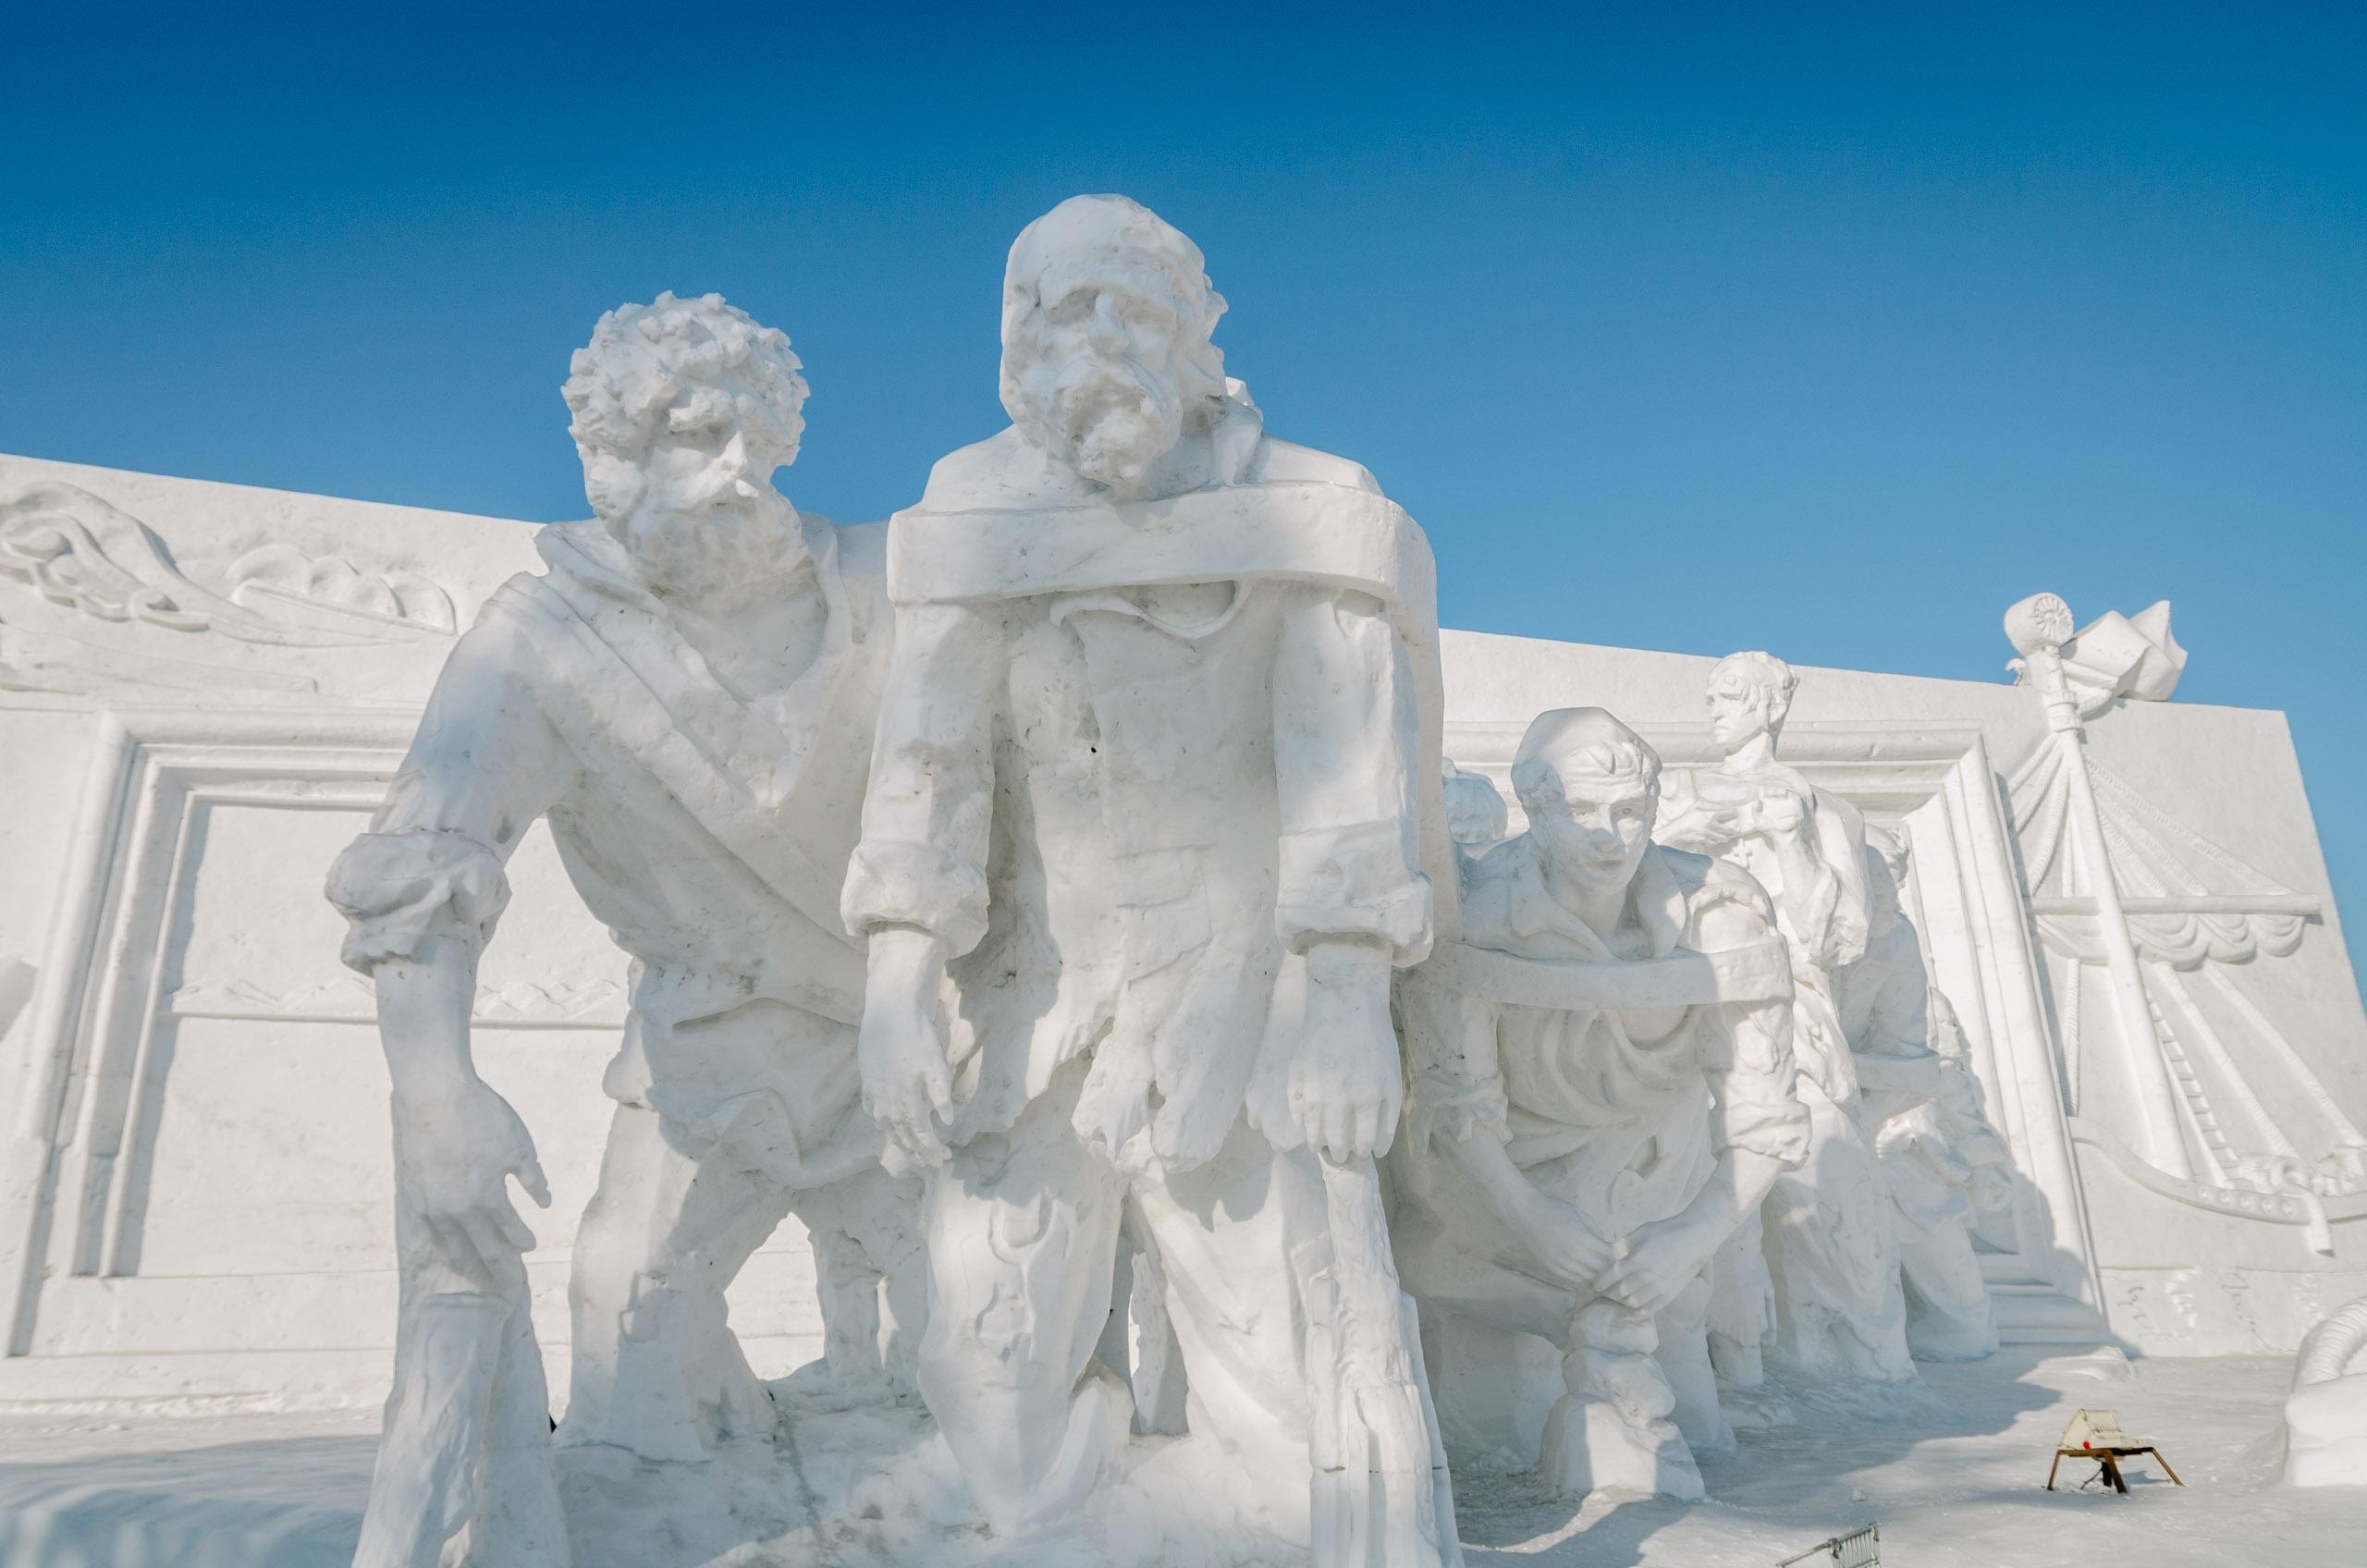 Harbin China Ice Festival - 2012-0108-DSC_2134_37994